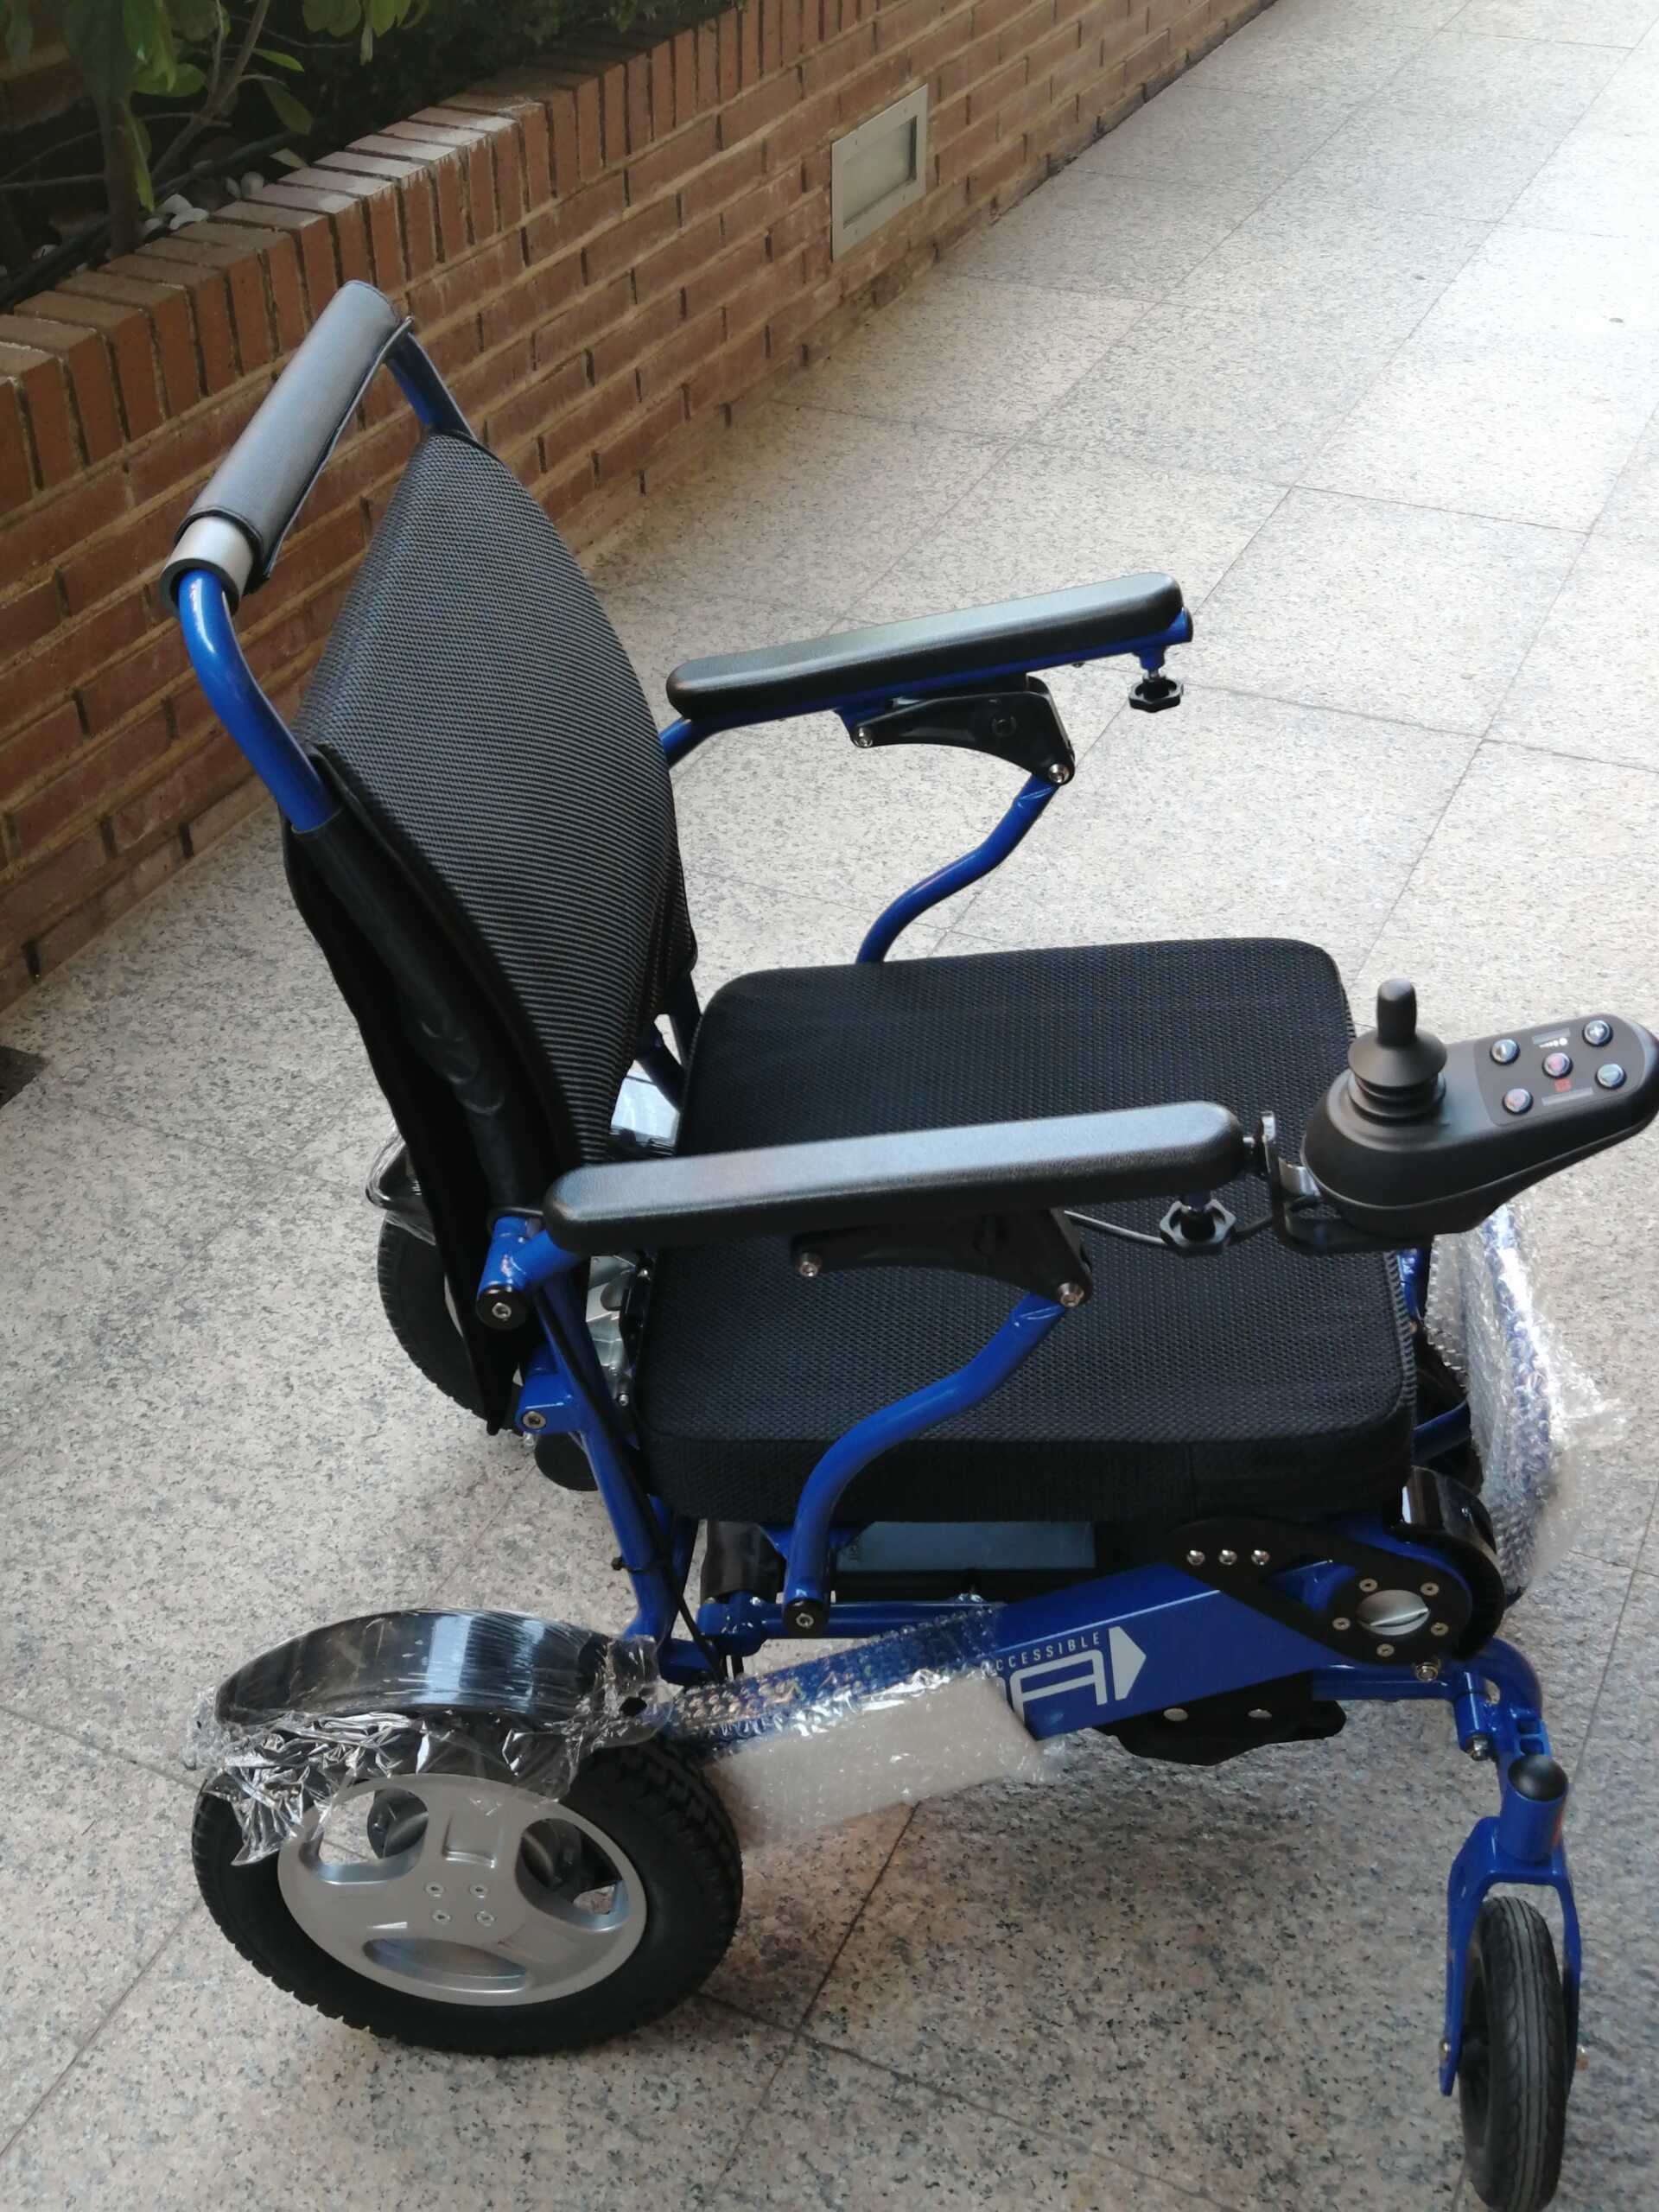 Sillas para Discapacitados SPA en Azul con batrerias de litio extraibles